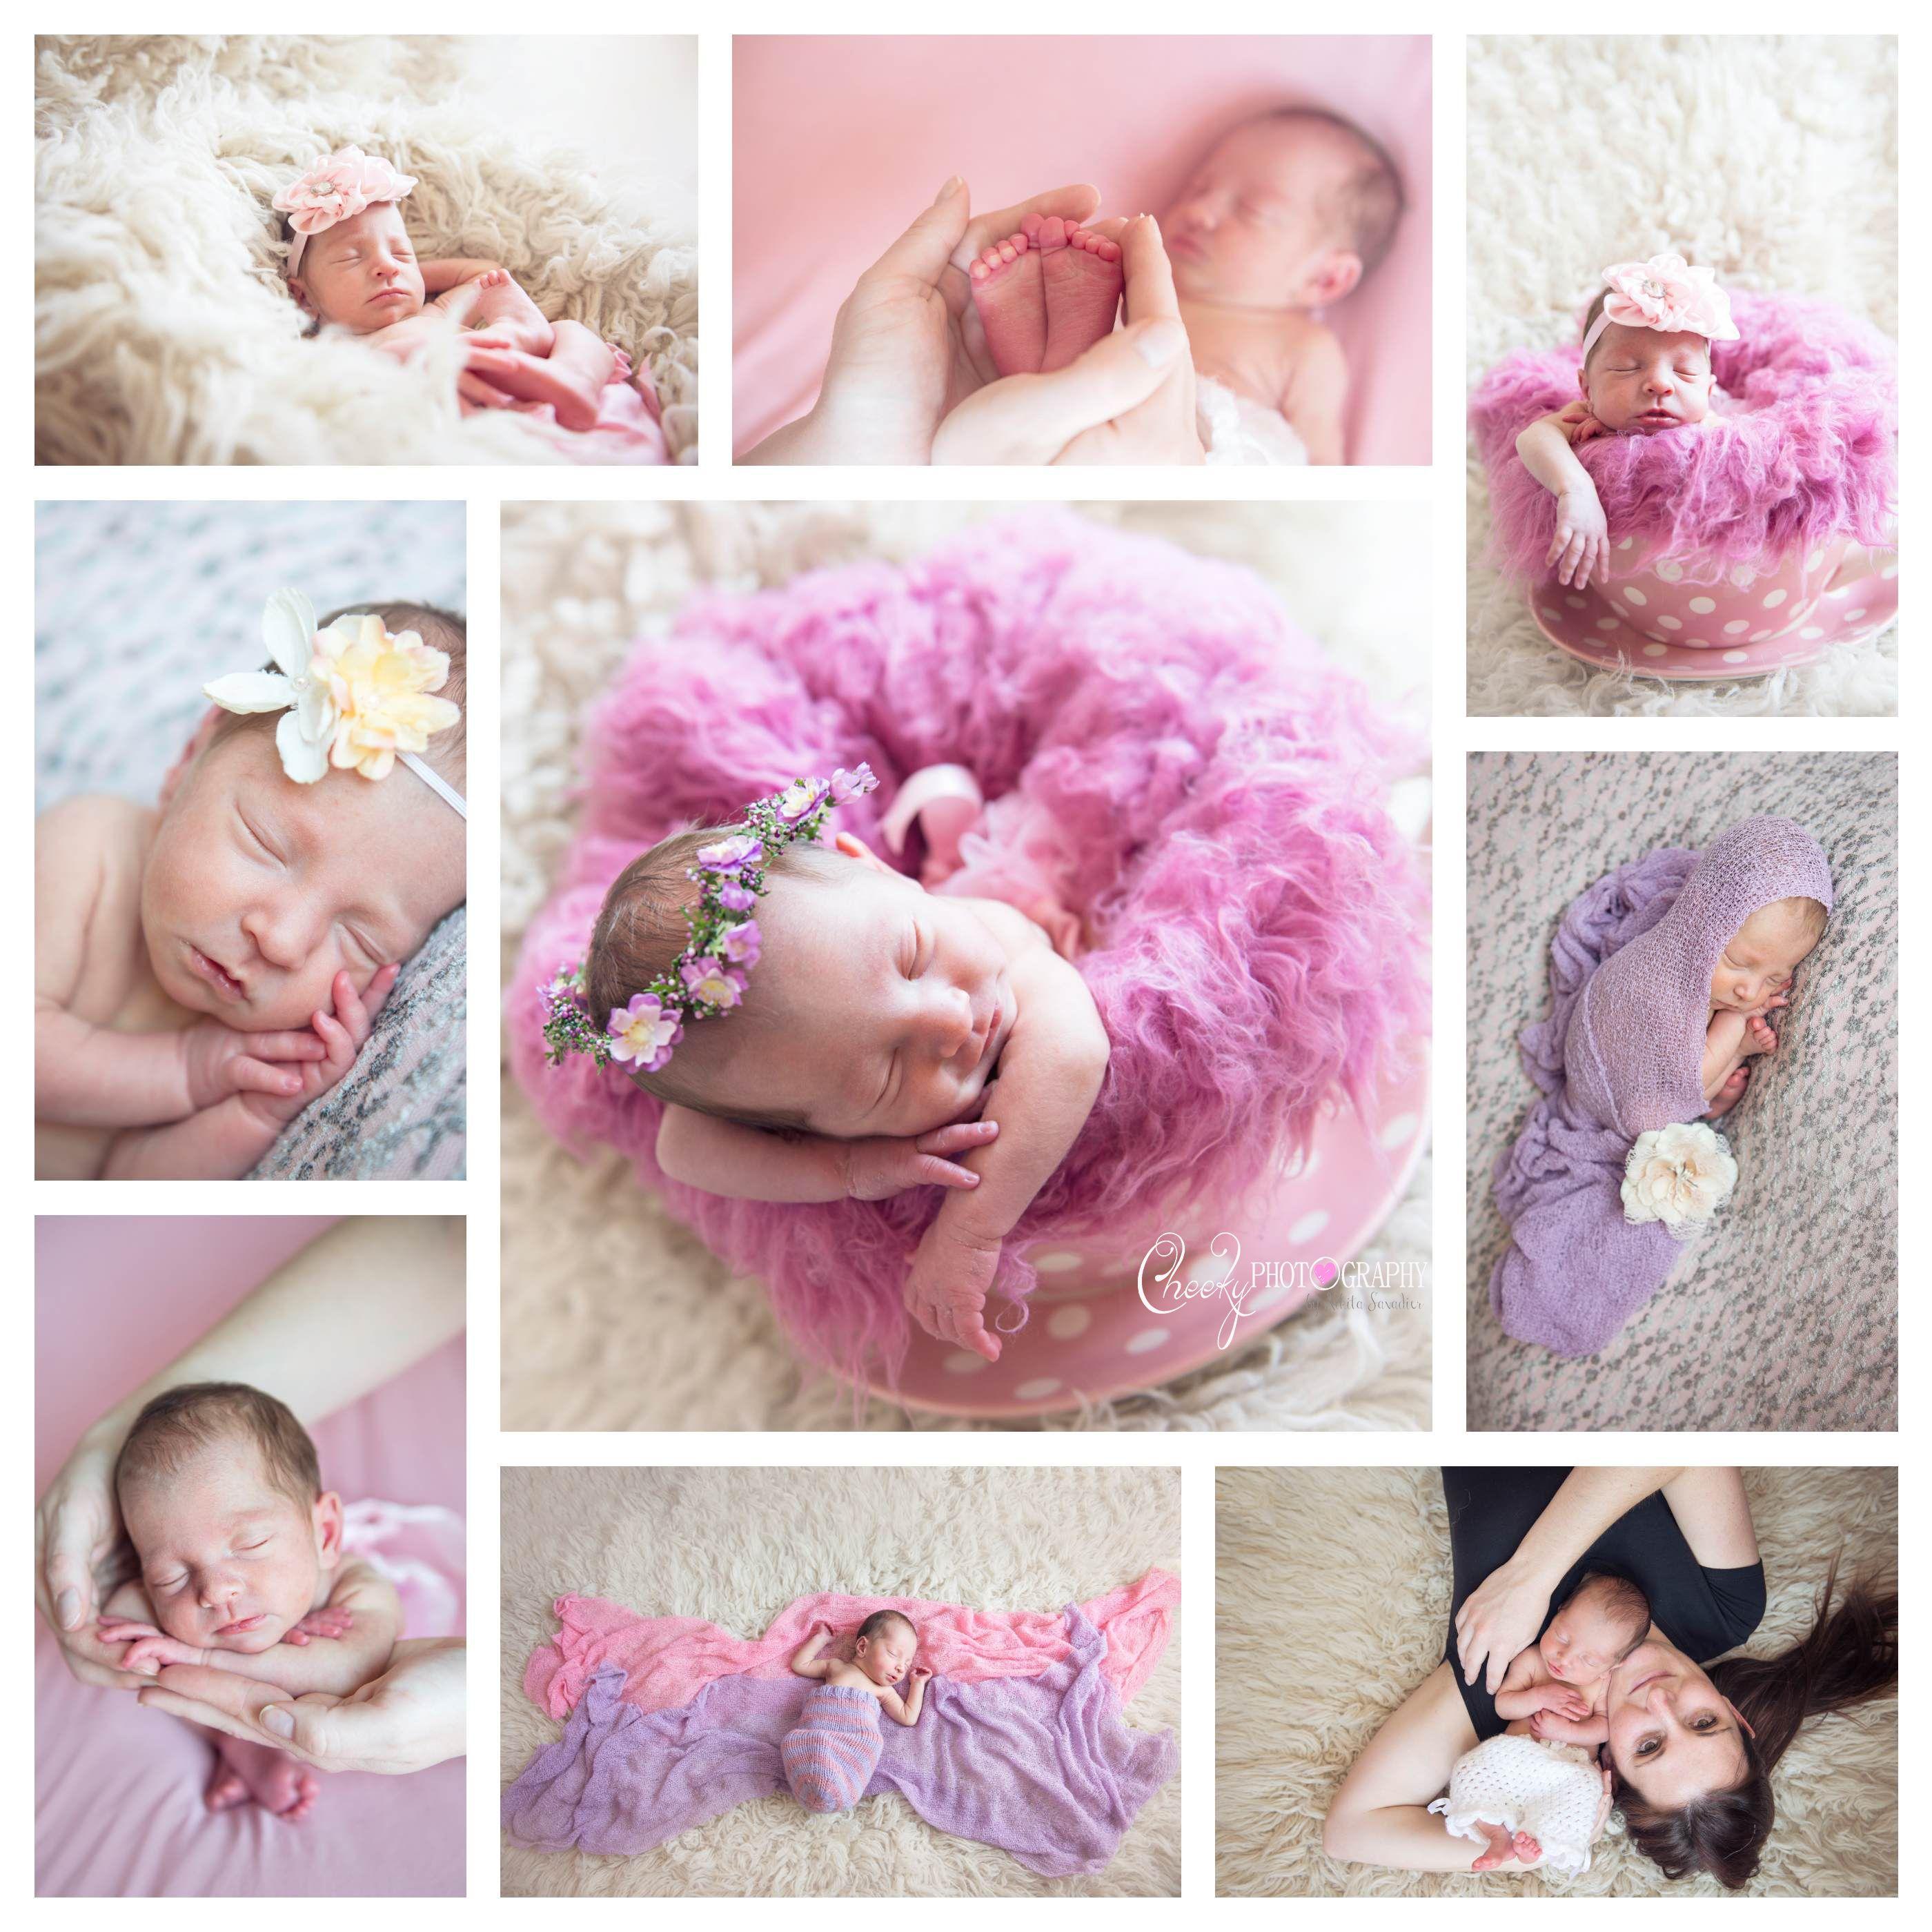 Baby Newborn Photography Props Flowers Pillow Girls Boys Photo Shoot Accessories